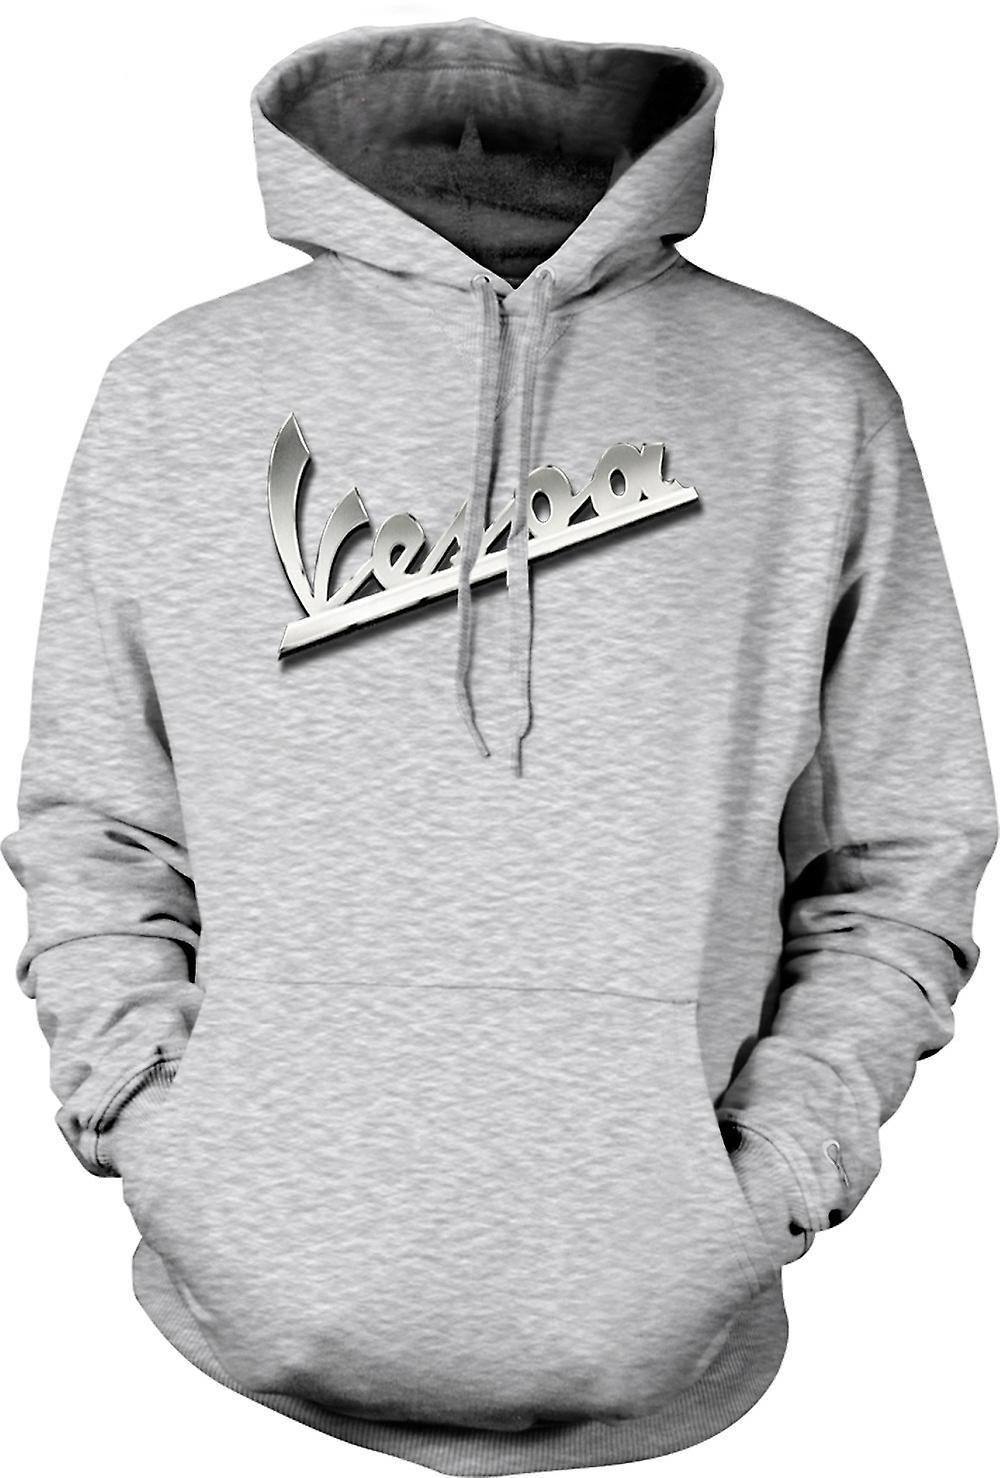 Mens Hoodie - Vespa - Logo - Mod - Scooter